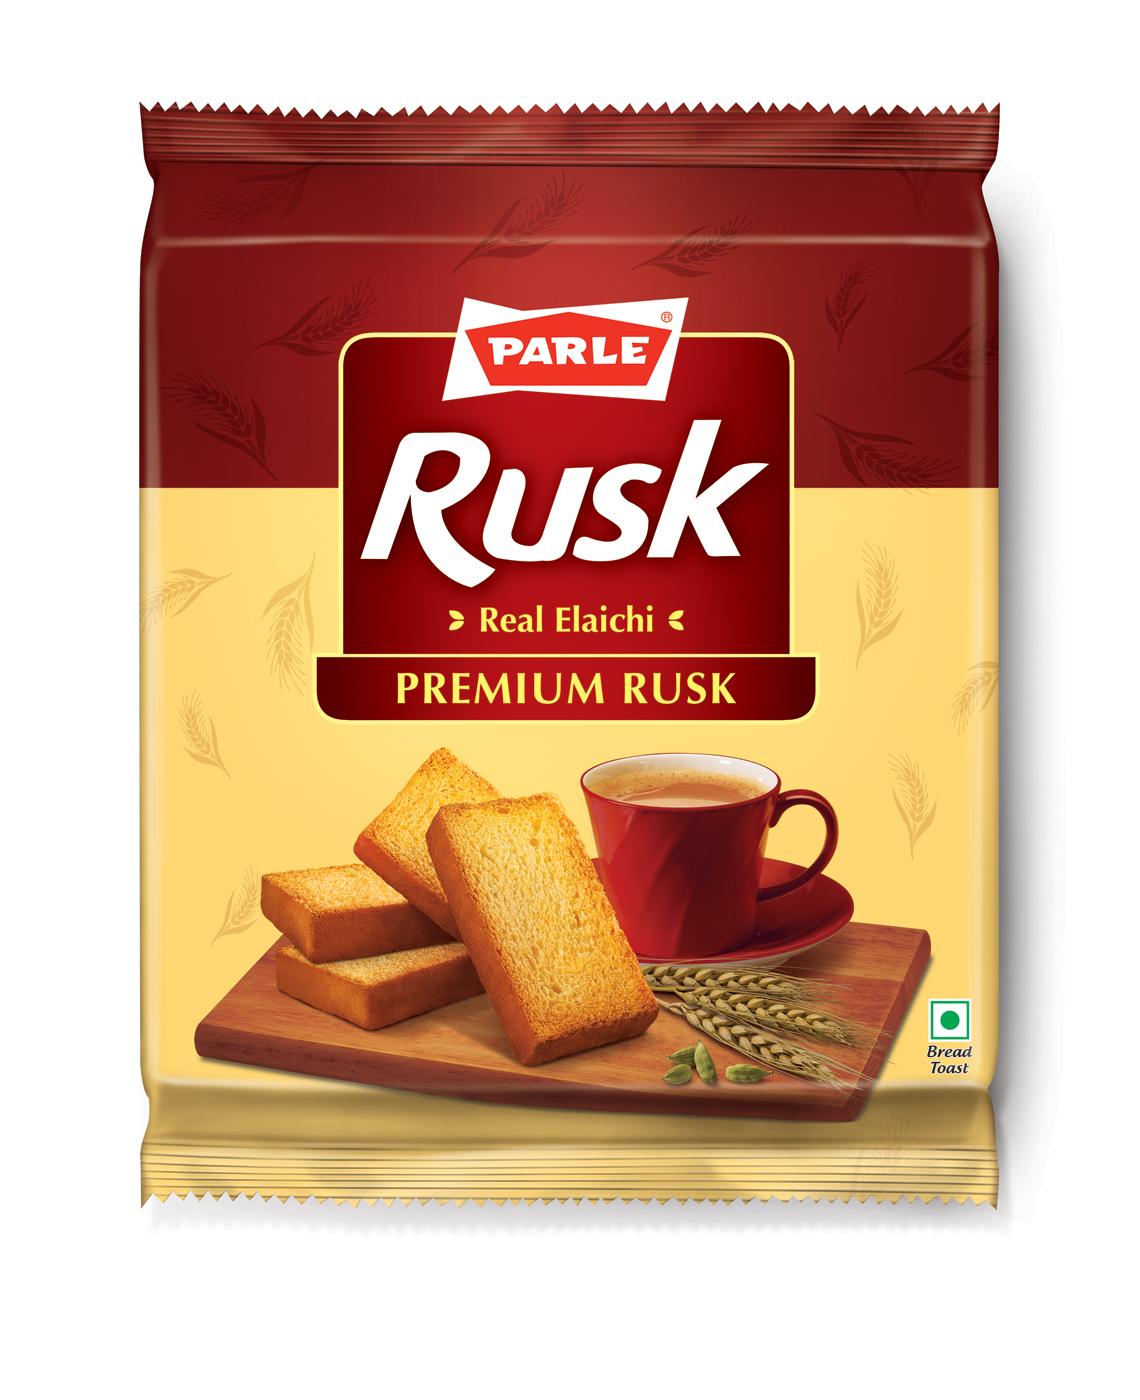 Parle Rusk Image